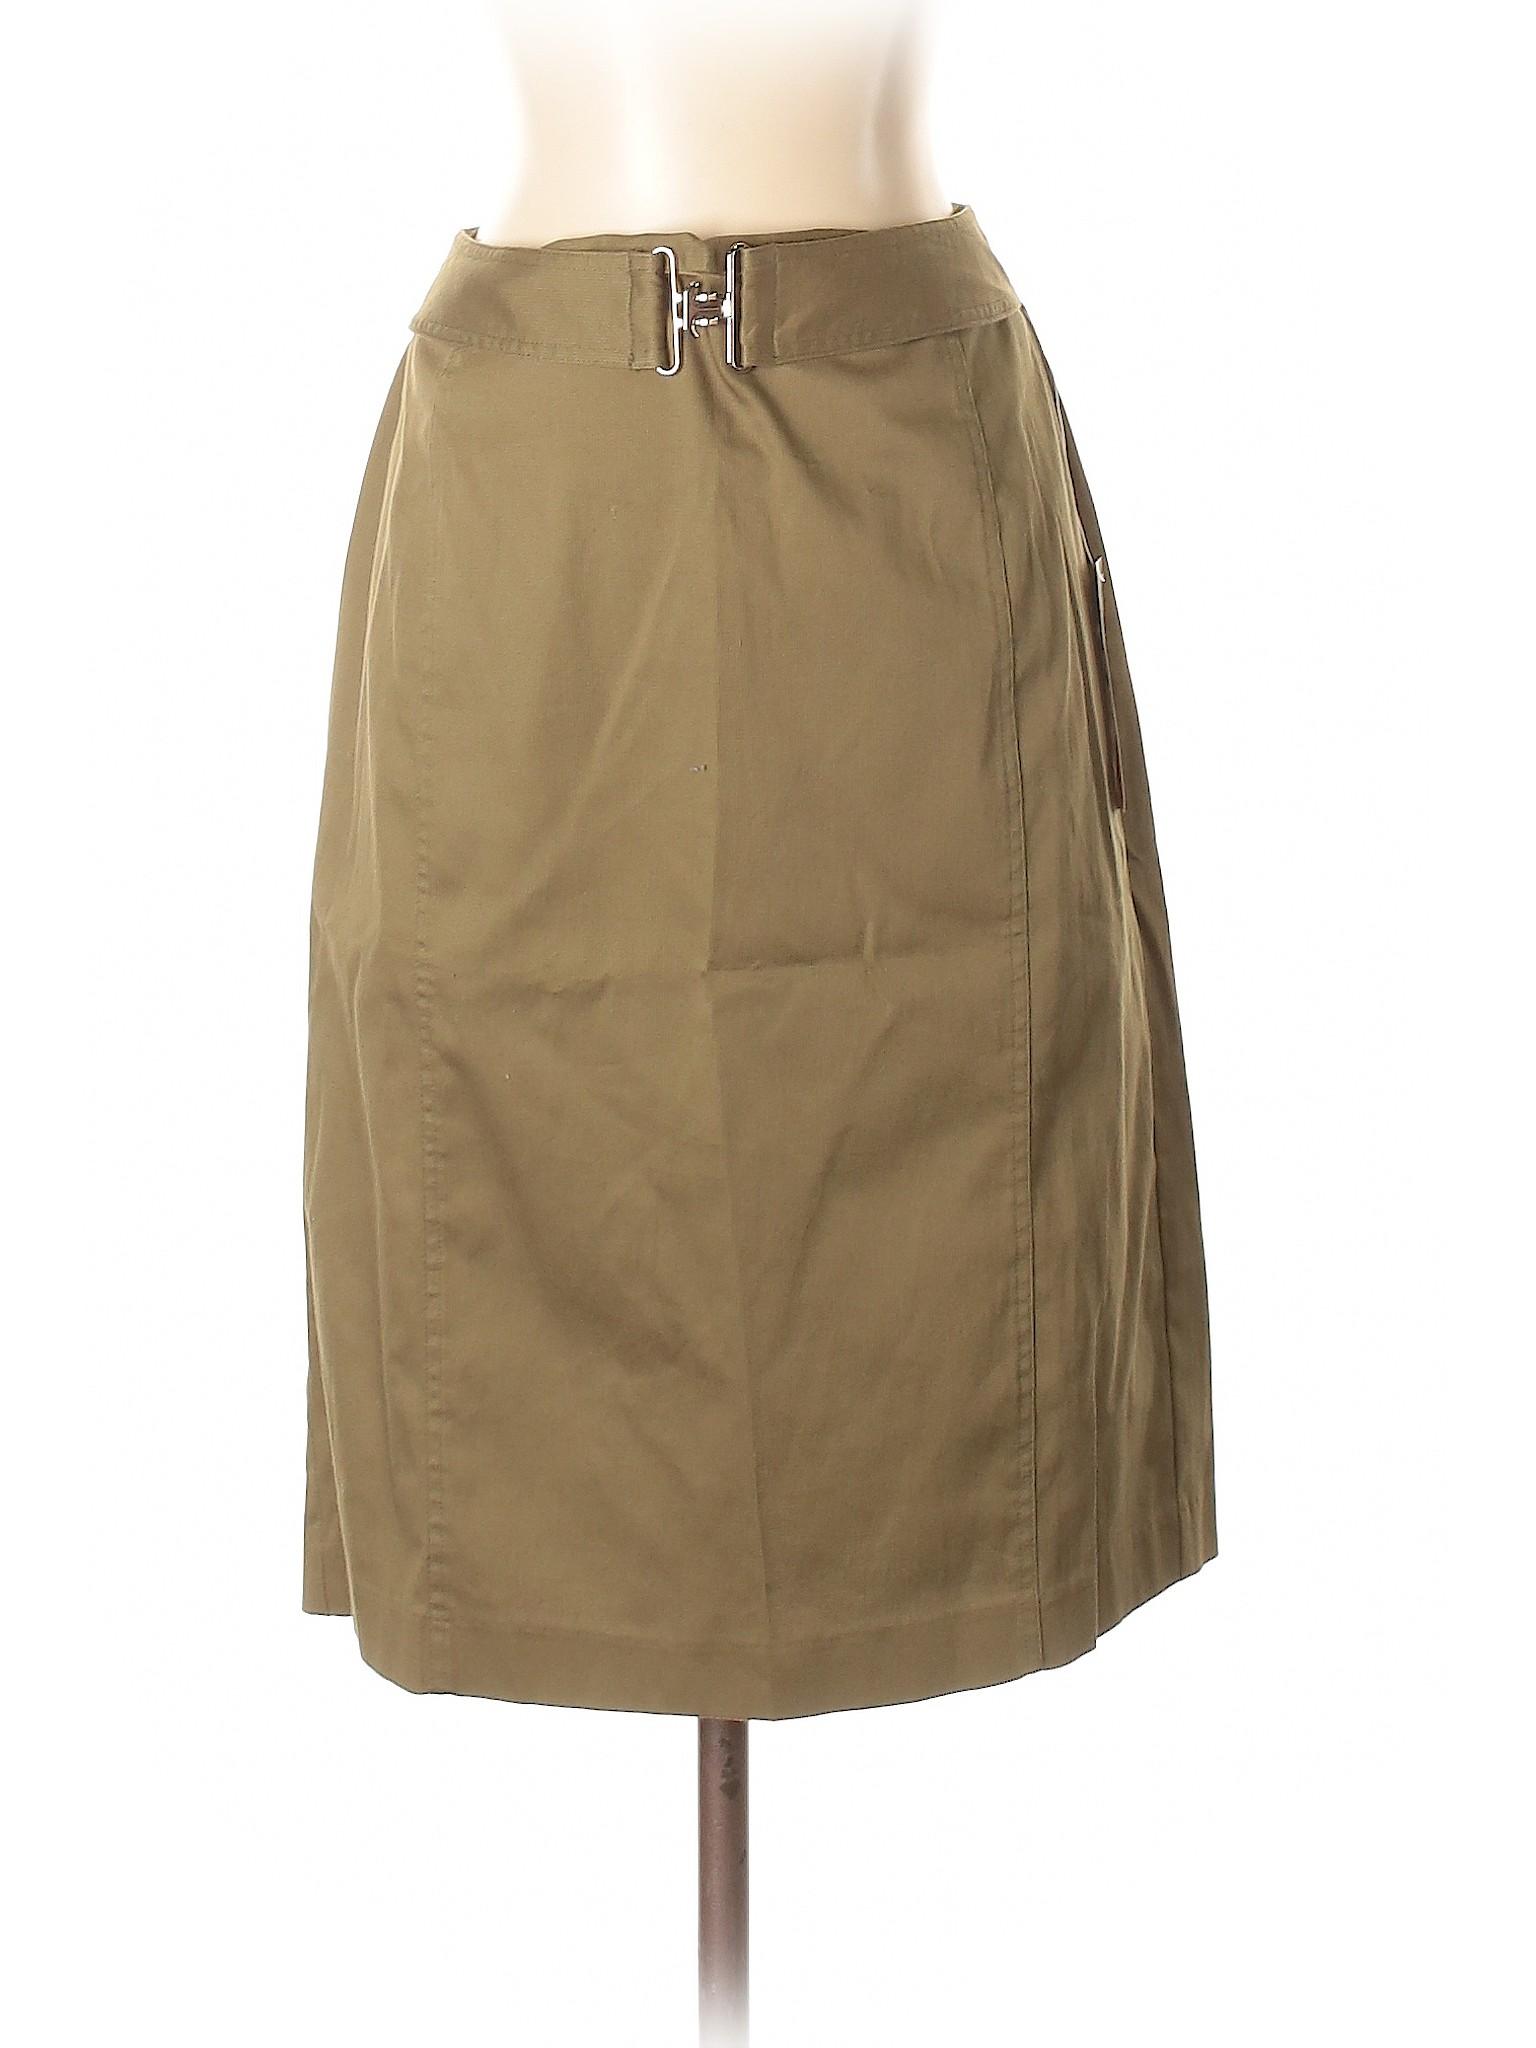 Skirt Bandolino Casual Bandolino Boutique Boutique Bandolino Casual Boutique Skirt Skirt Boutique Casual Bandolino 8vdZX4